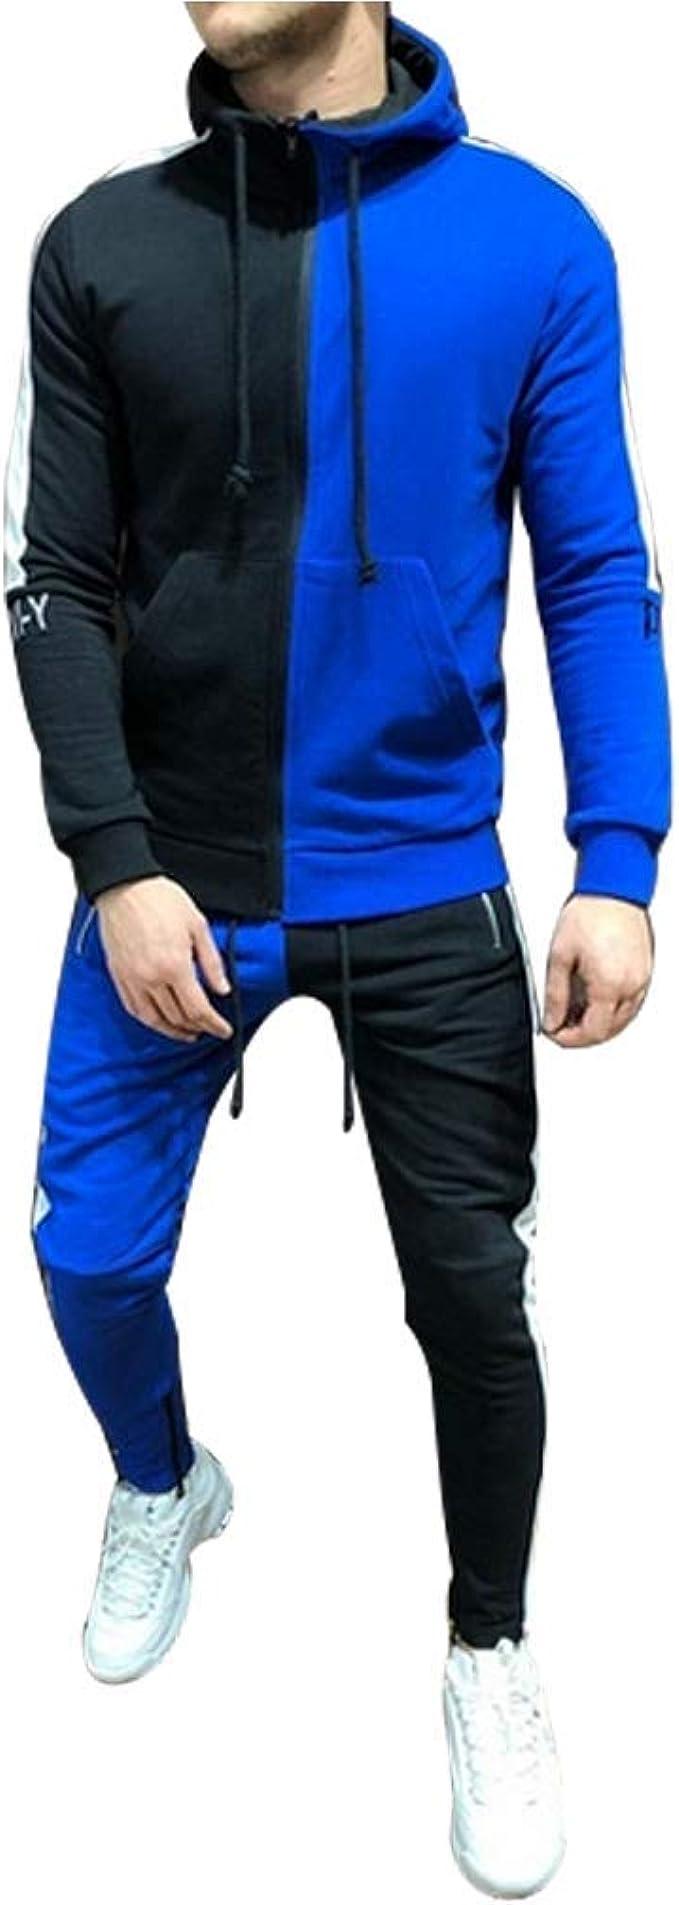 pipigo Mens Quick Dry Gym Workout Summer T-Shirt Sport Shorts 2 Piece Outfits Tracksuits